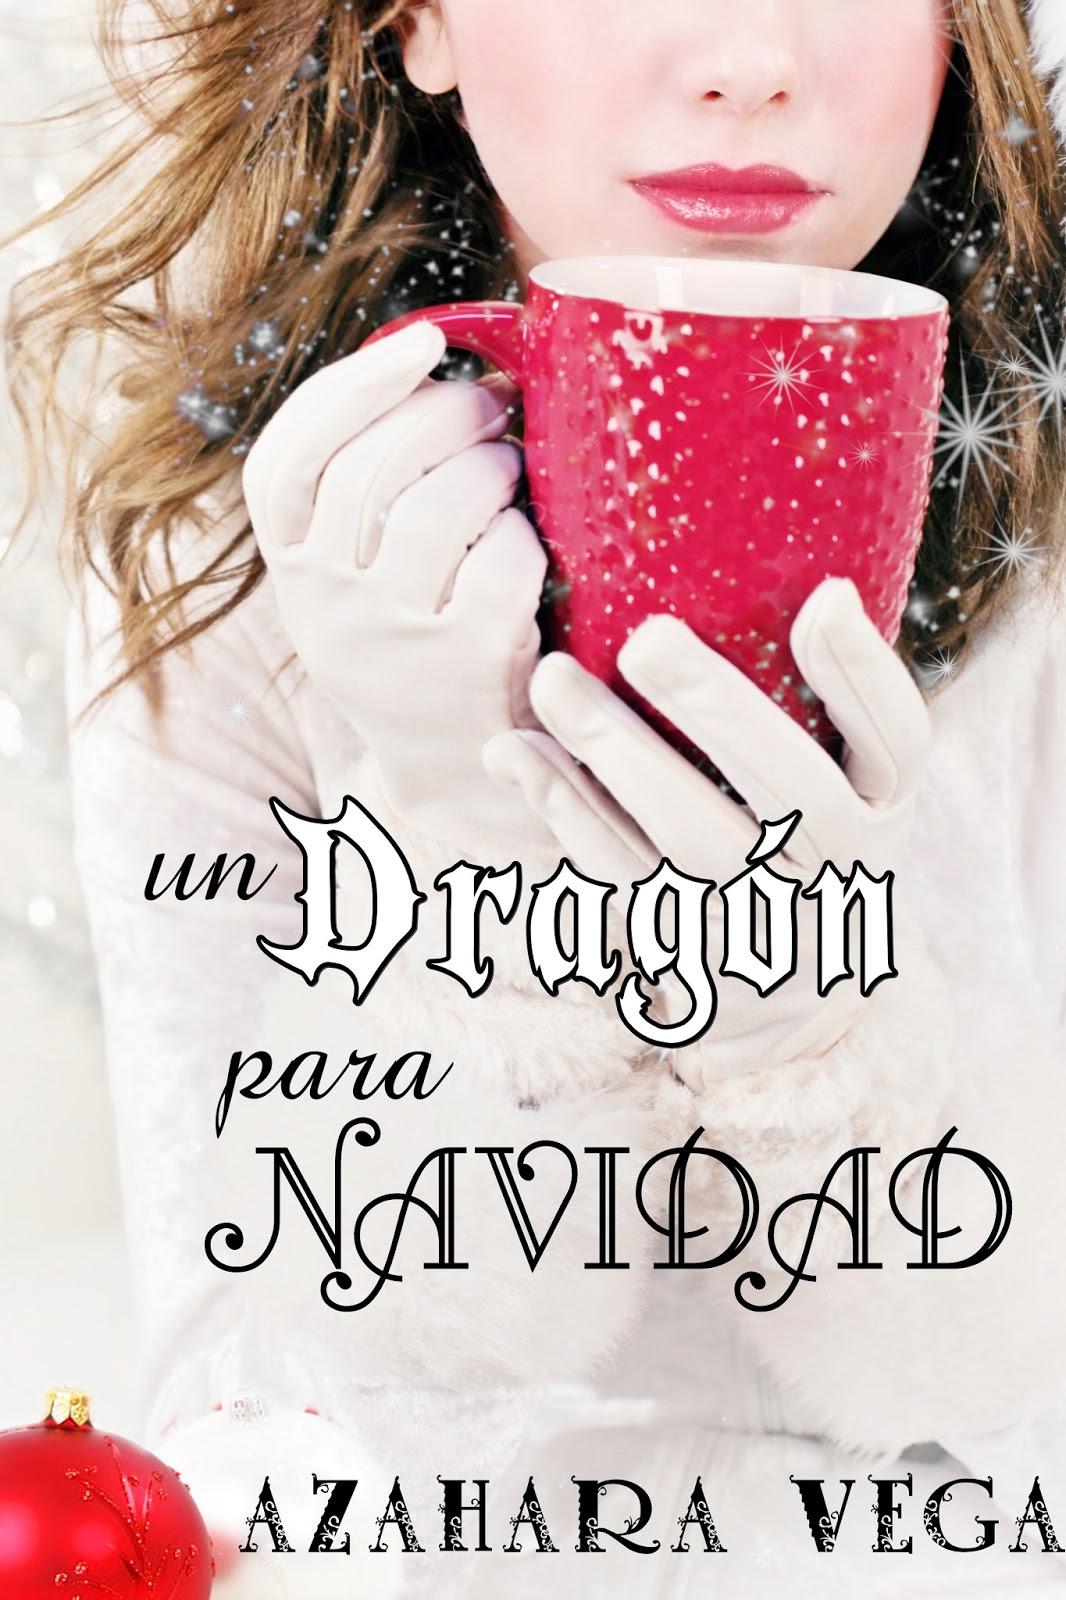 "Alexa Fede Y La Cornuda Maria Se Masca La Tragedia blog de sheyla drymon |page 2, chan:55323882 |rssing"""